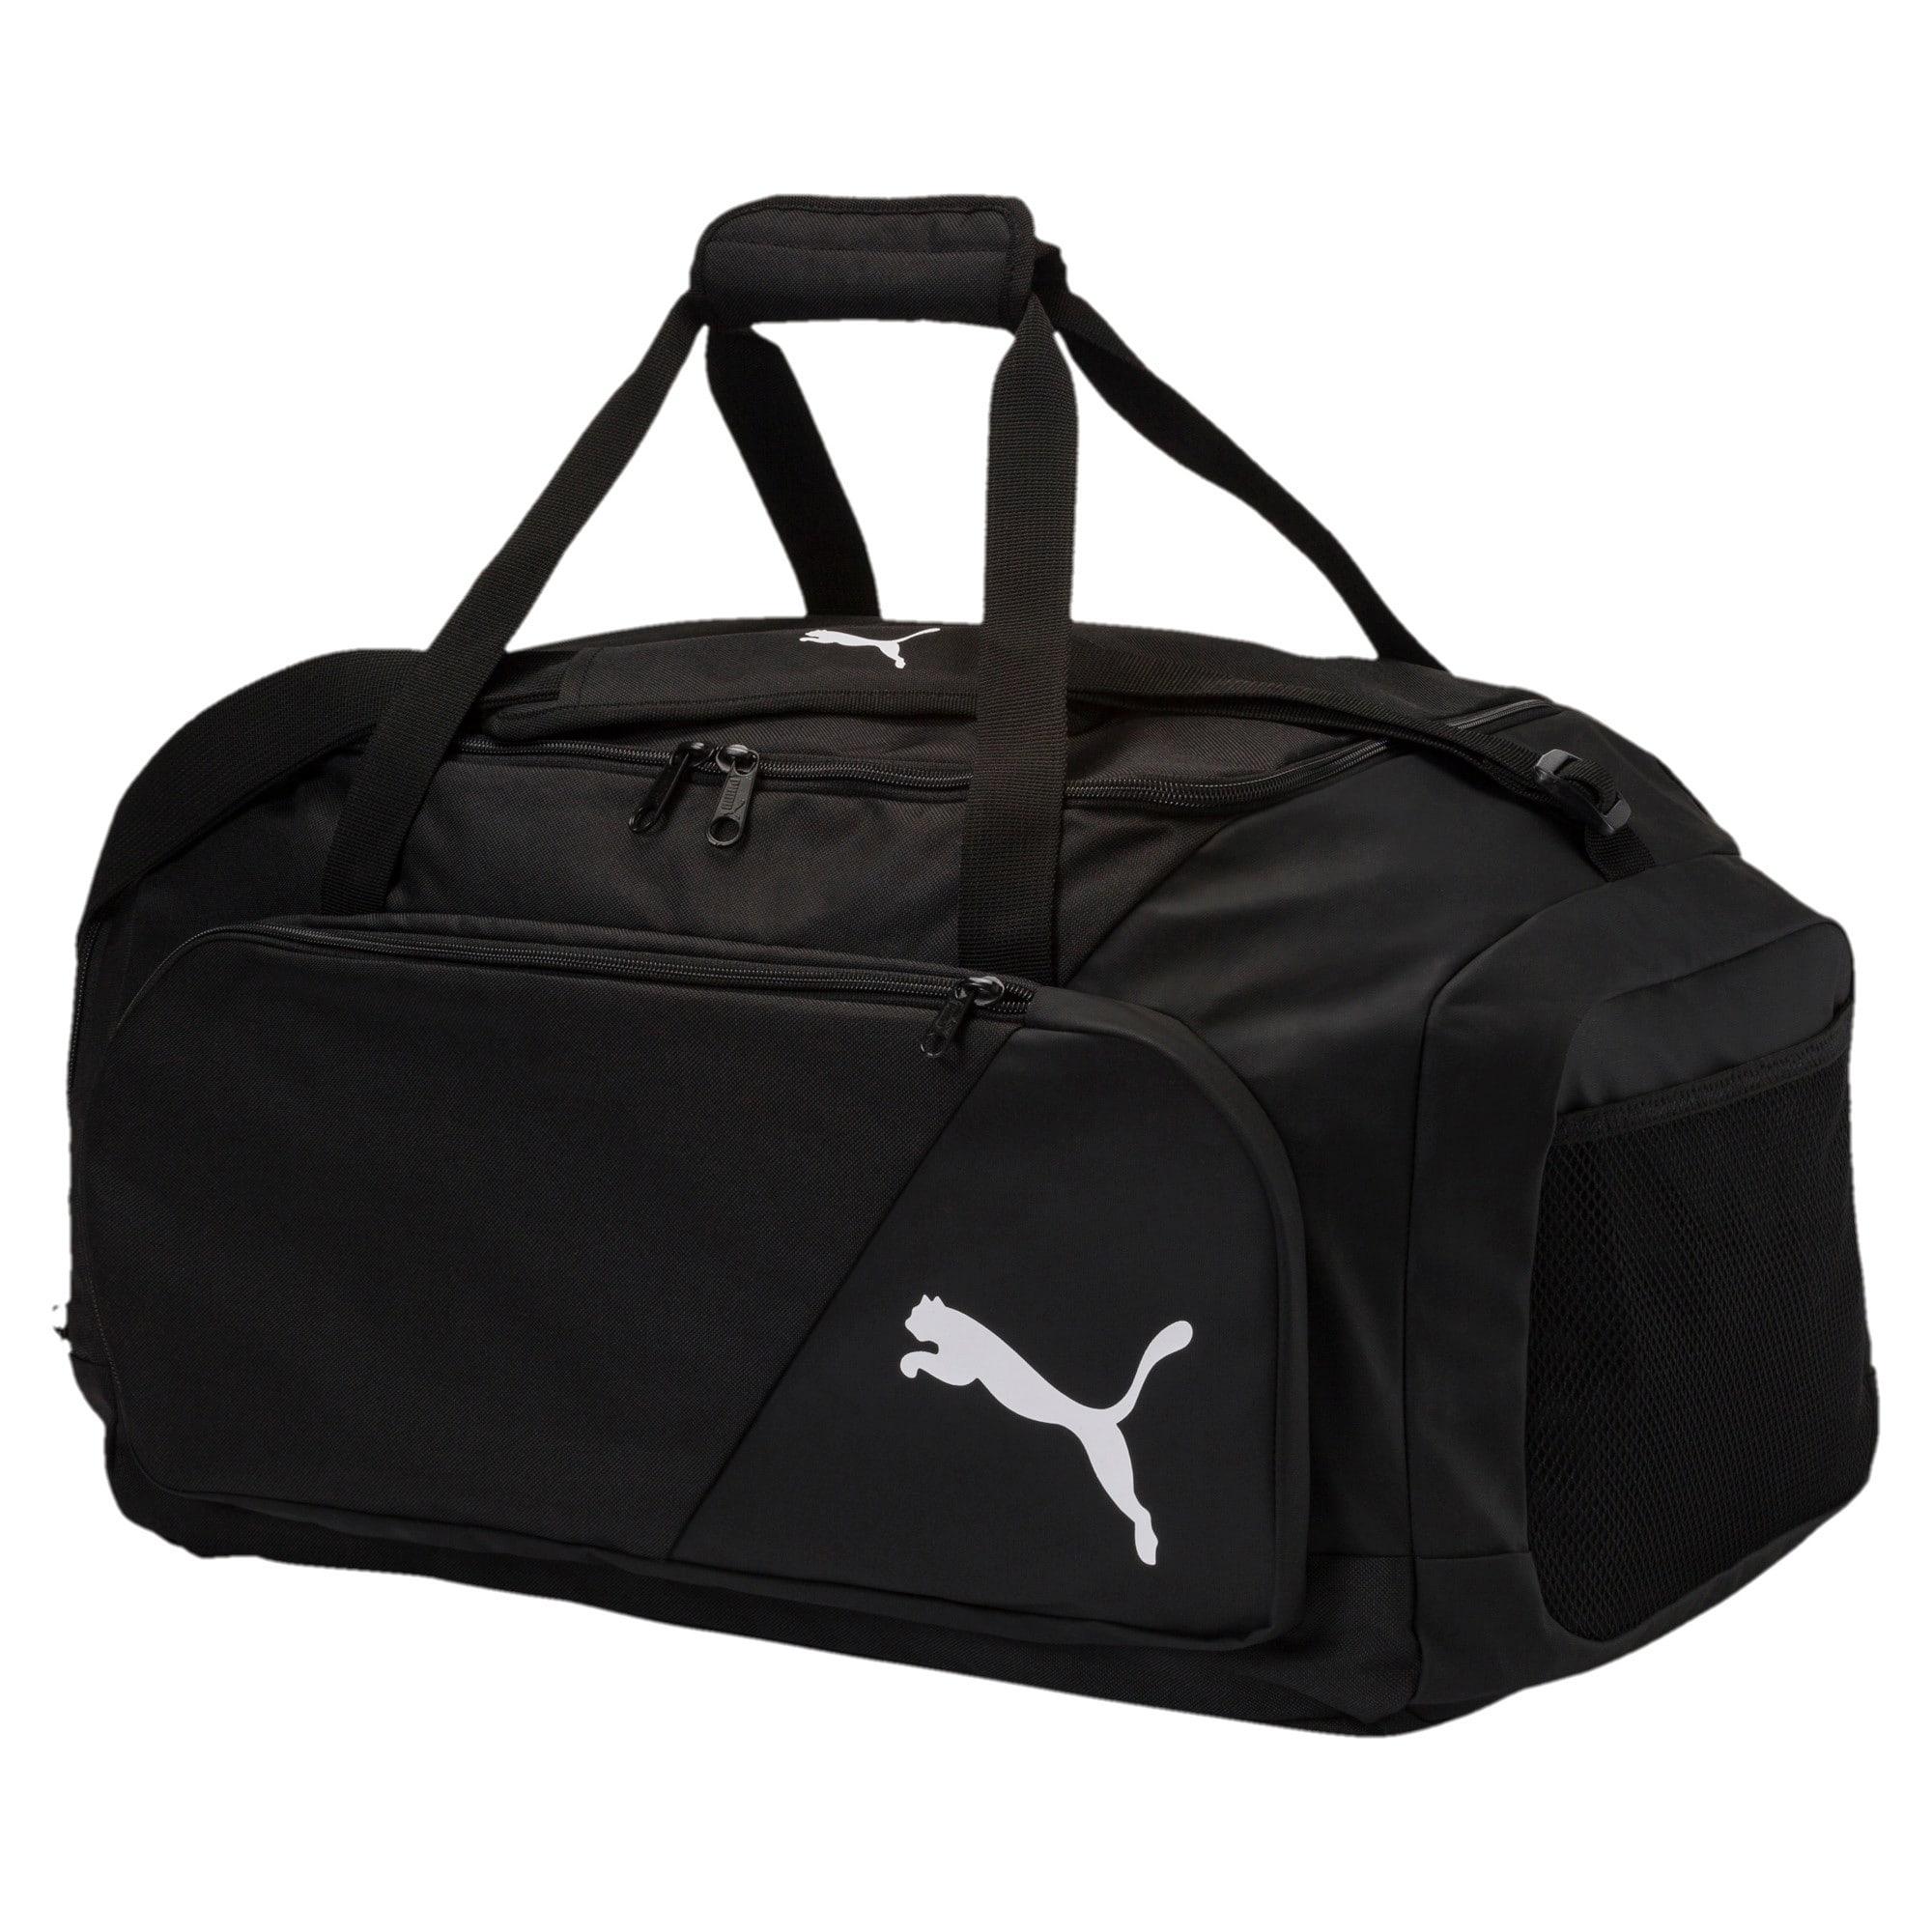 Thumbnail 1 of Liga Medium Bag, Puma Black, medium